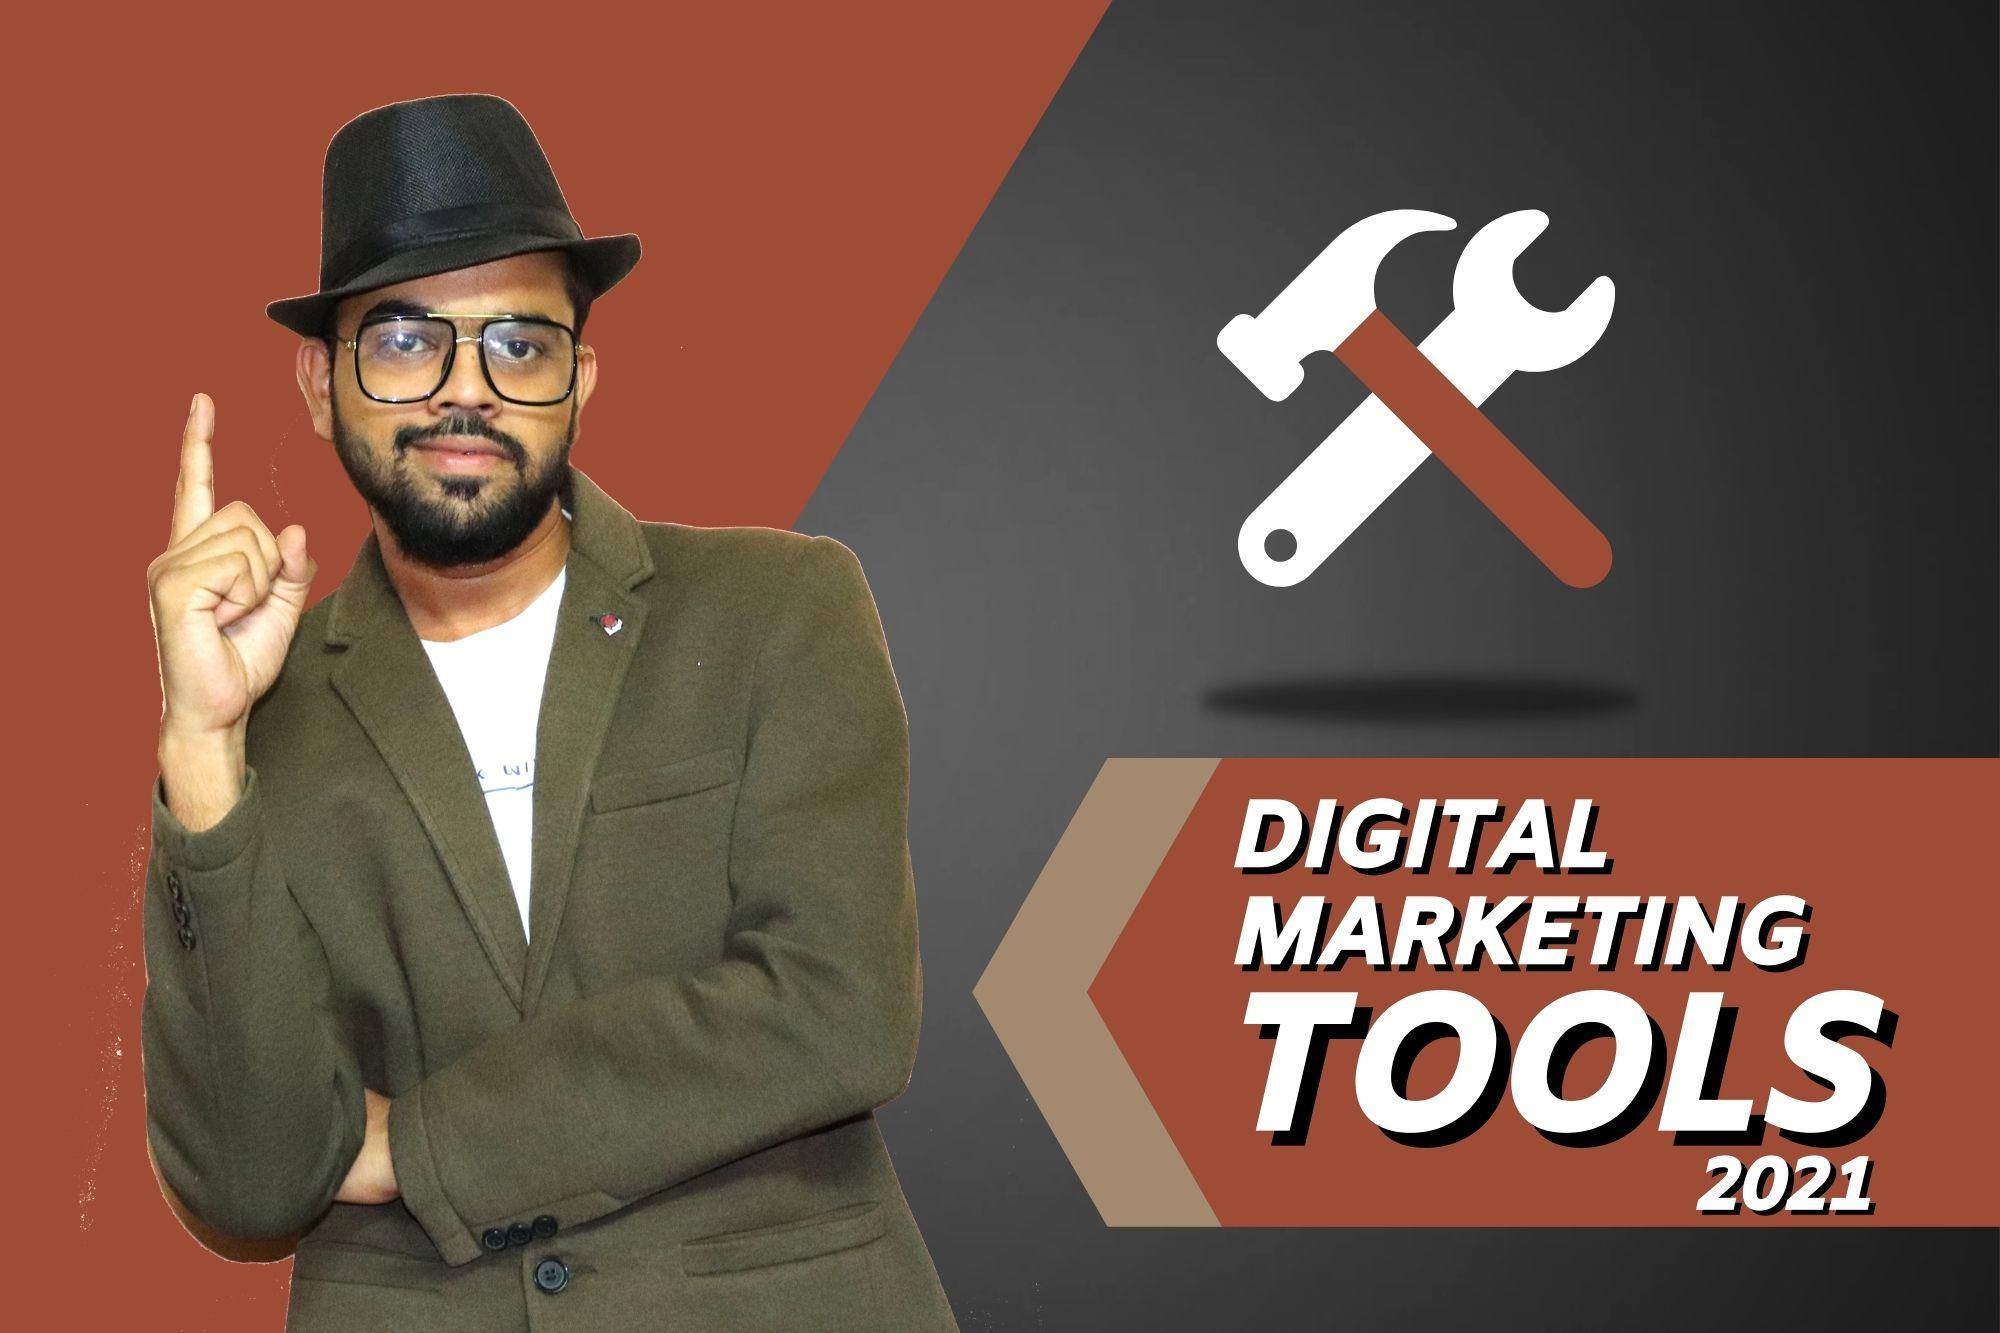 Digital Marketing Tools In Hindi 2021 | Digital TK